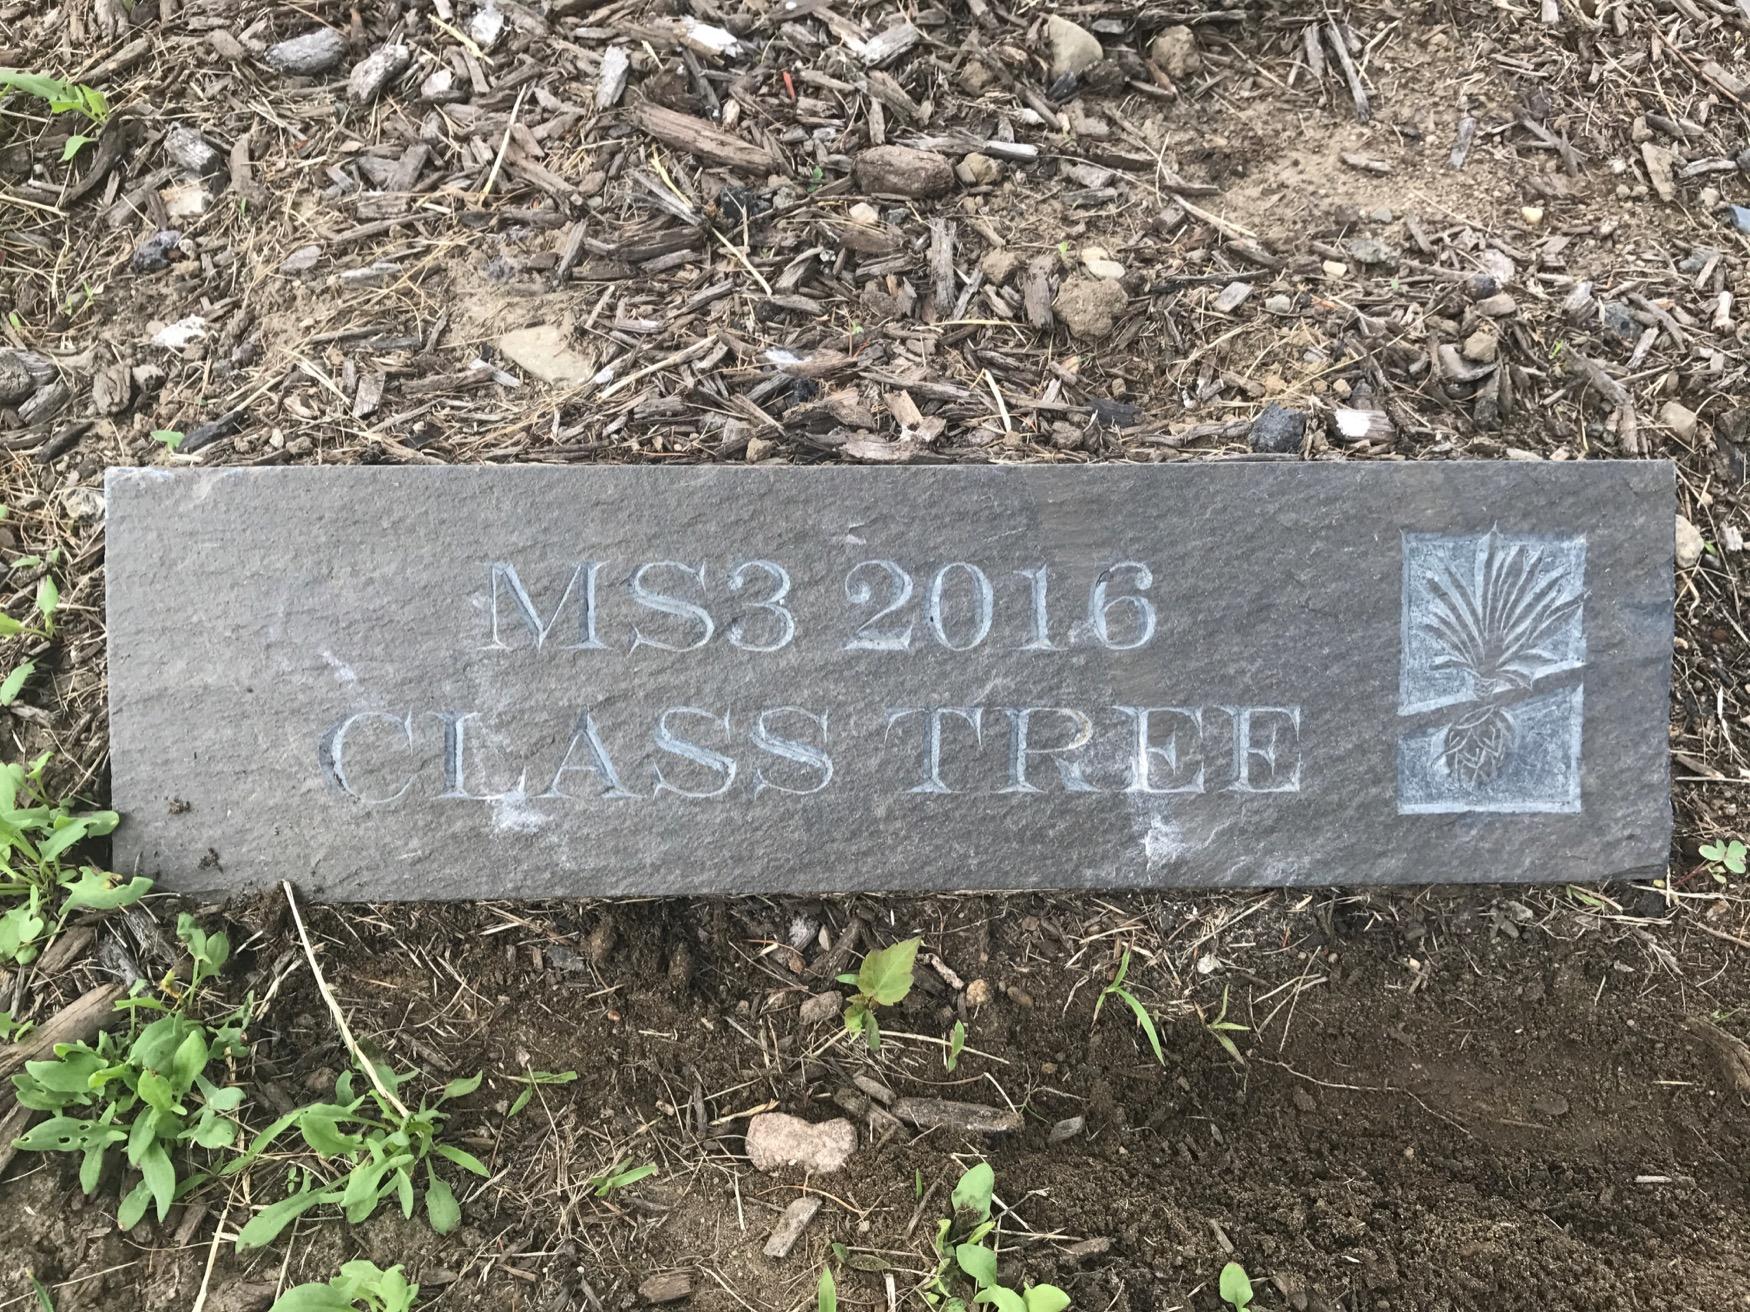 MS3 Class Tree of 2016 Plaque